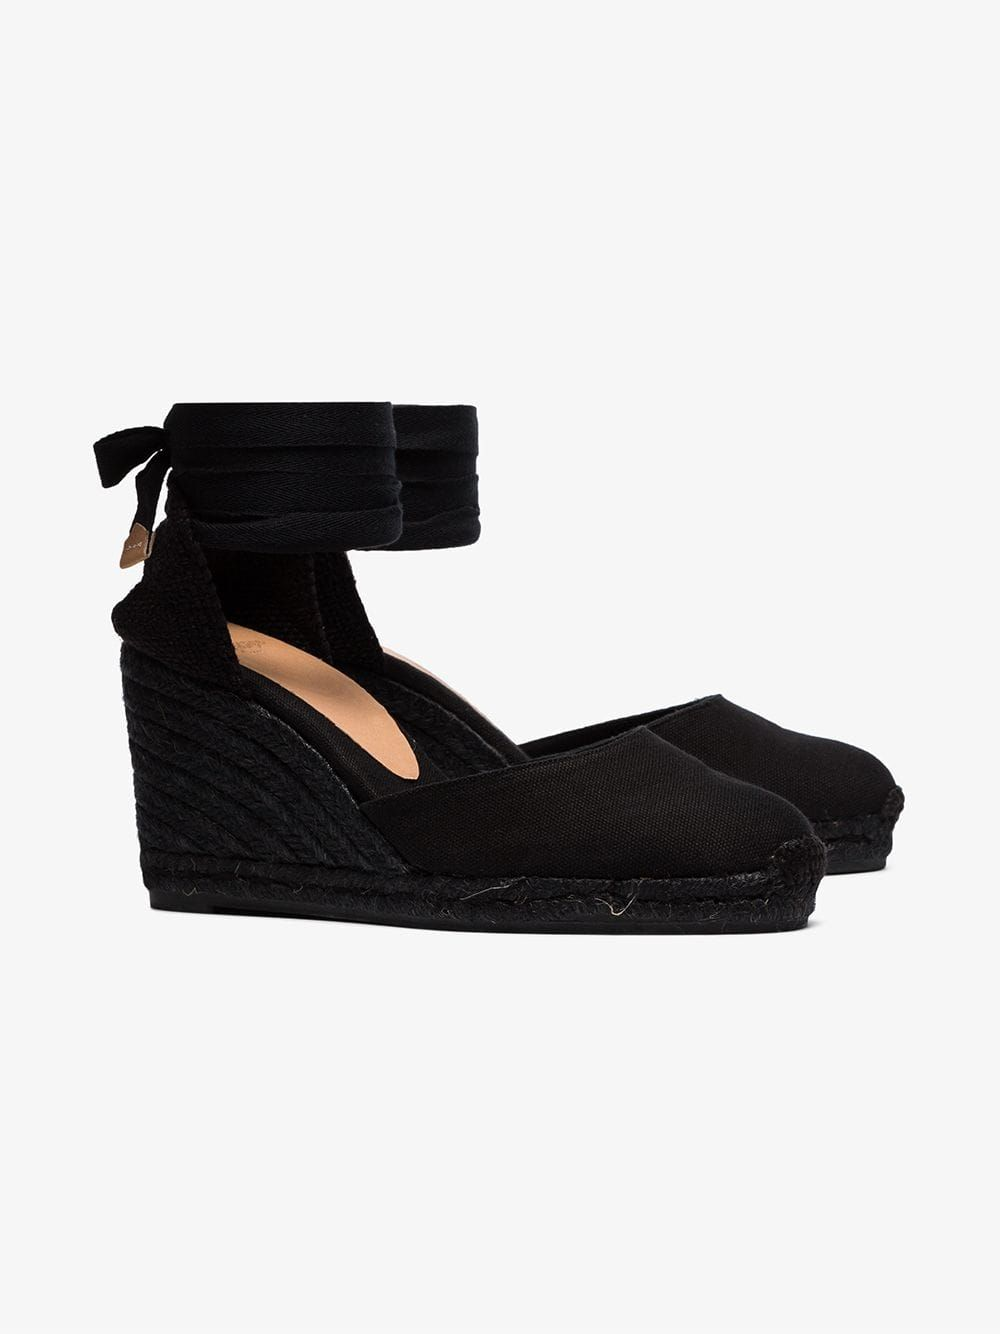 6644e9648fe1 Castañer black Carina 80 ankle tie wedge sandals